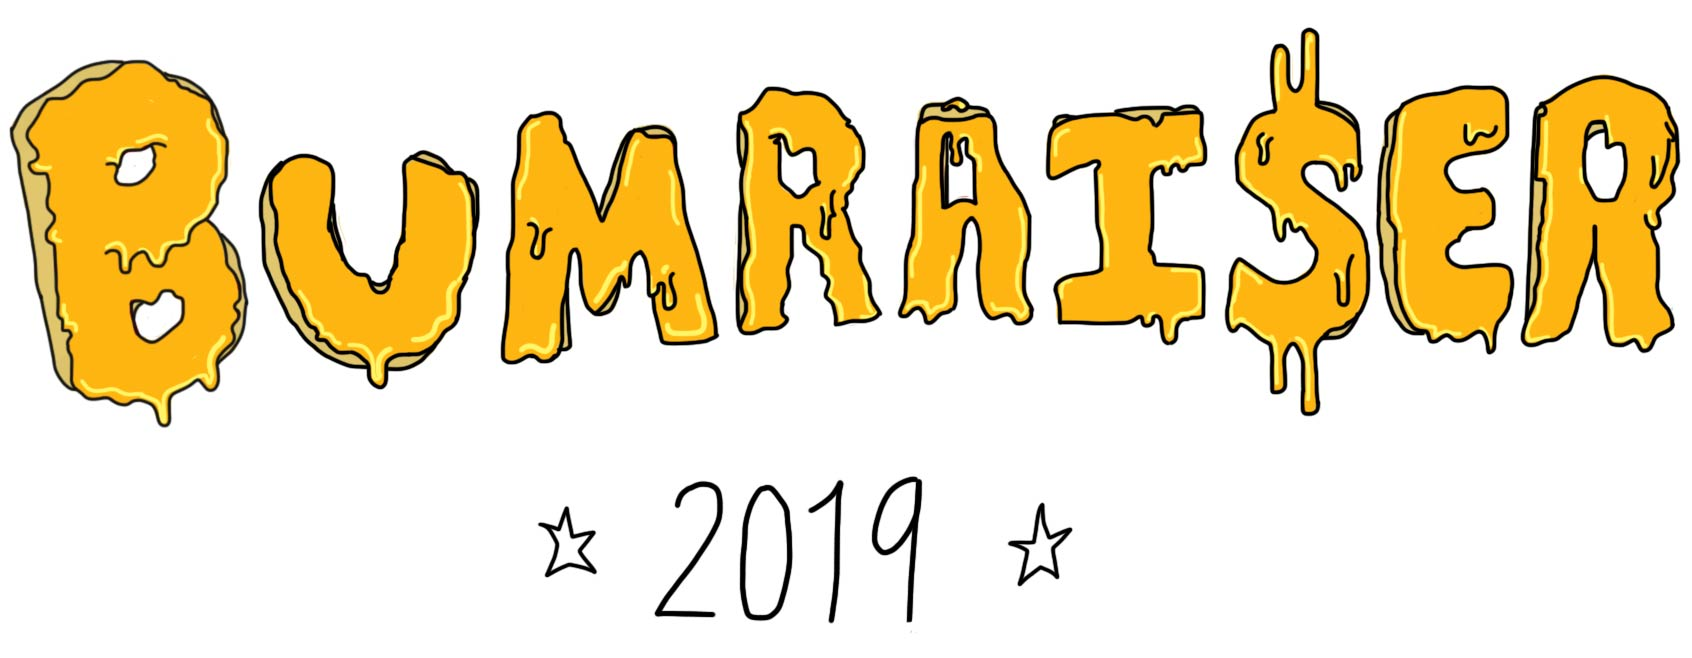 bumraiser-2019-graphic.jpg